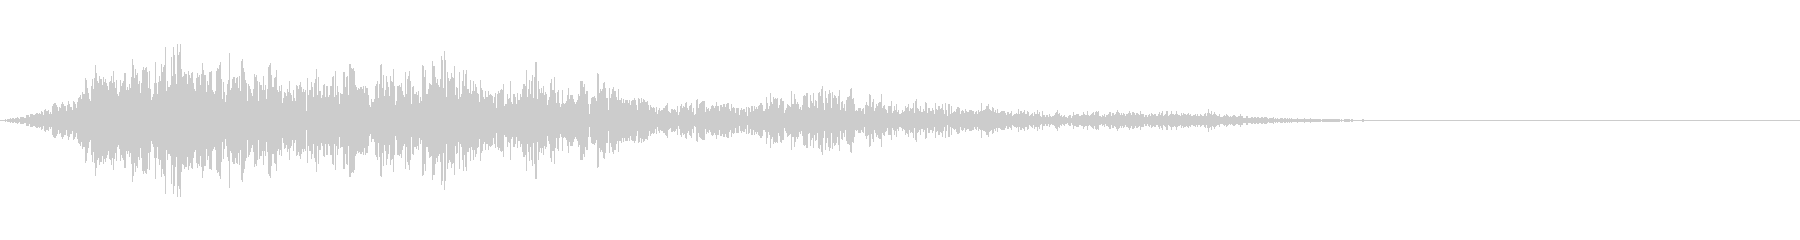 SF 移動音 19の未再生の波形